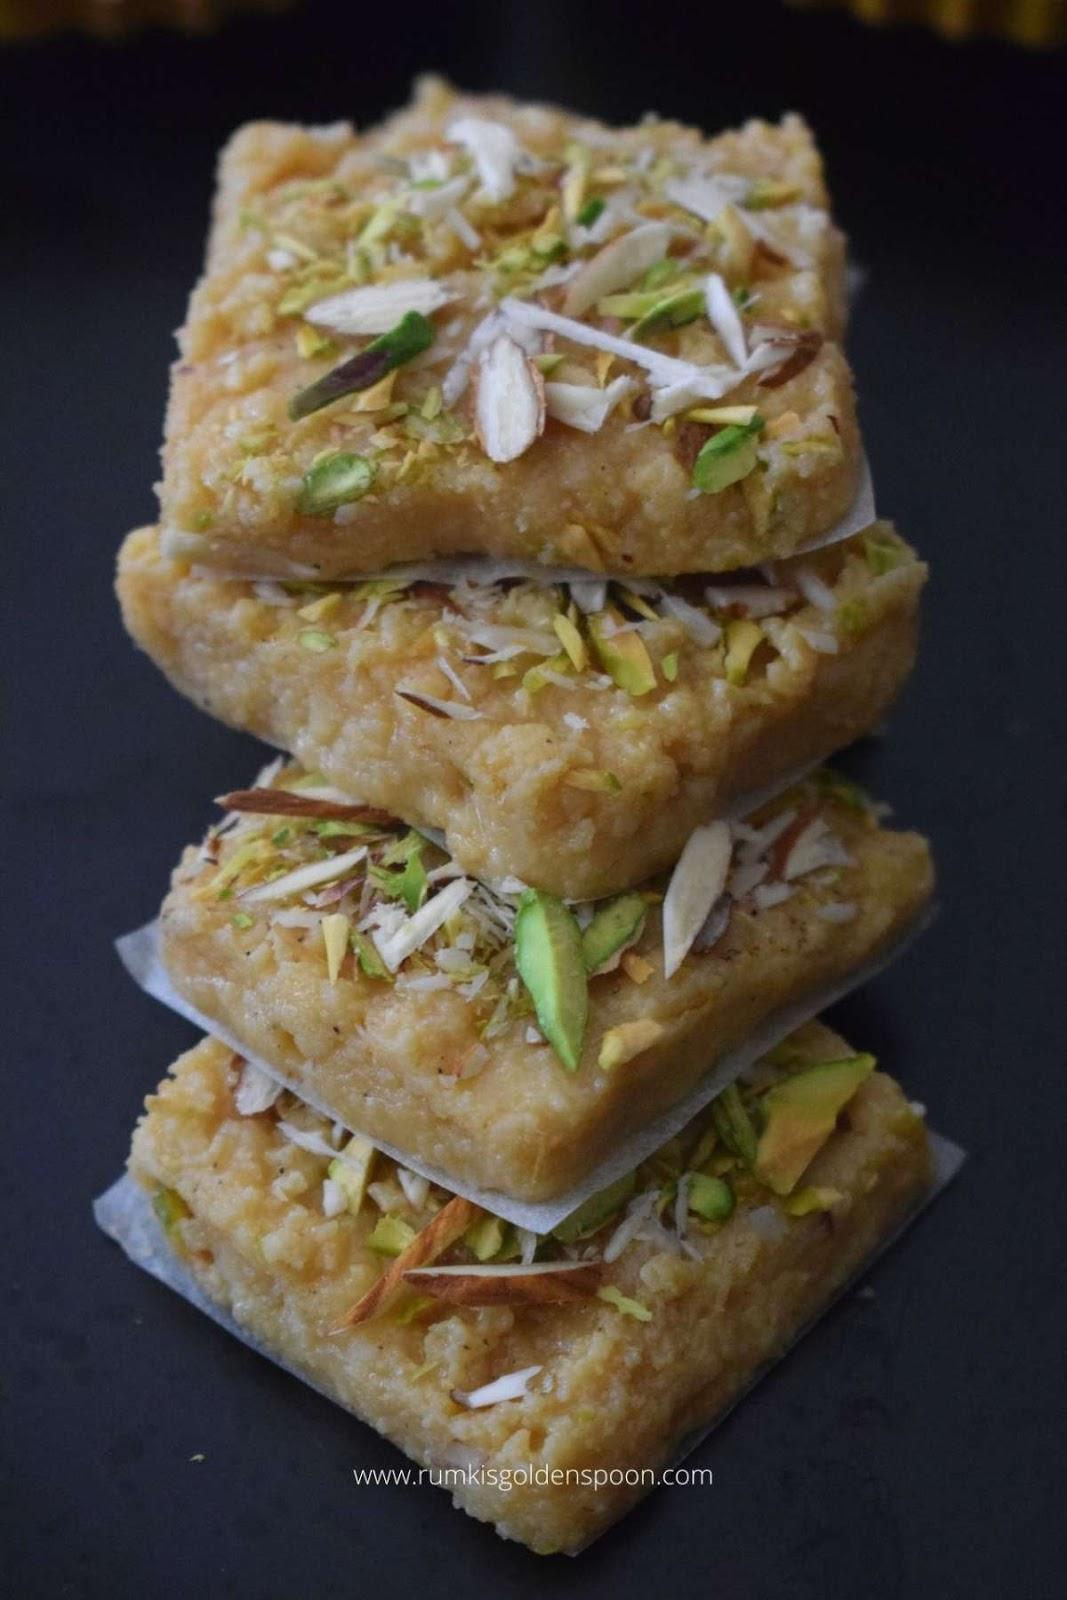 Kalakand, kalakand sweet, kalakand recipe, recipe for kalakand, how to make kalakand, quick kalakand recipe, instant kalakand recipe, instant kalakand, kalakand recipe with condensed milk, kalakand mithai, Kalakand barfi, best kalakand recipe, how to make kalakand at home, how to make kalakand sweet, Indian sweet, Indian sweets, indian dessert recipes, indian milk cake recipe, easy indian dessert recipes for dinner parties, instant indian dessert recipes, indian sweet recipes, indian sweets recipes, Indian sweet easy recipes, recipe for Indian sweet, indian sweet recipes for Diwali, Rumki's Golden Spoon